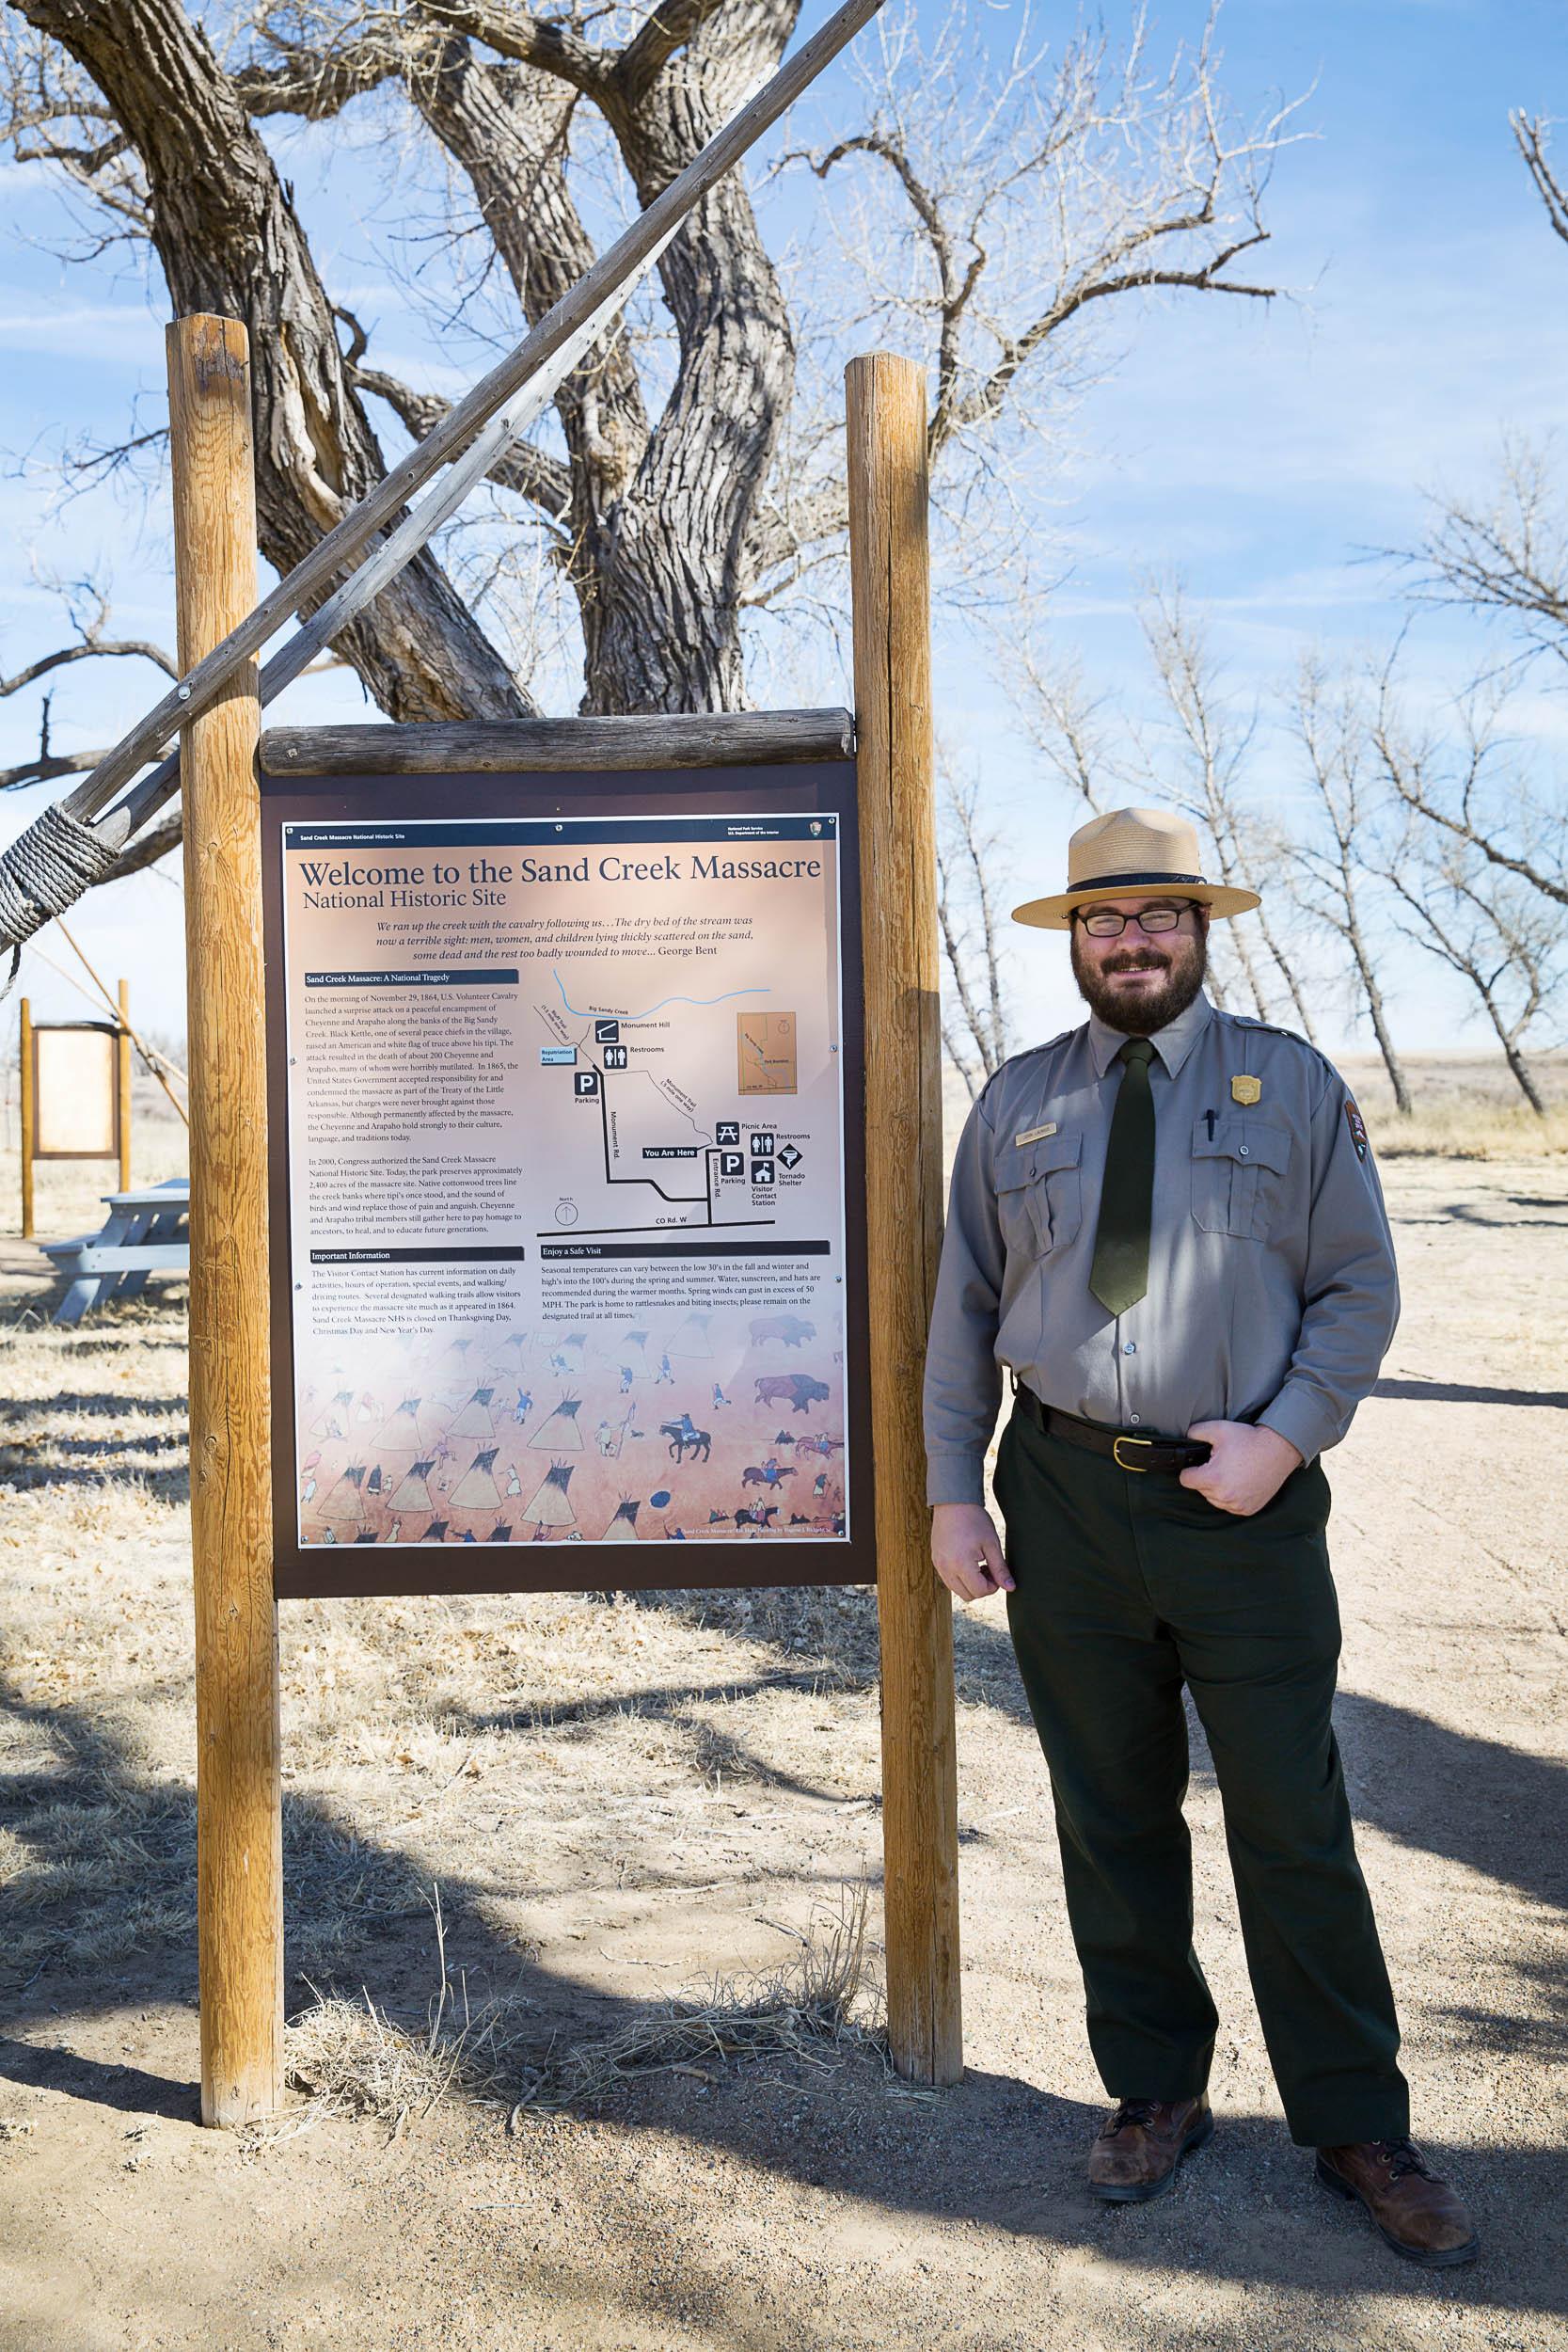 Ranger John Launius, National Historic Site of the Sand Creek Massacre, Colorado